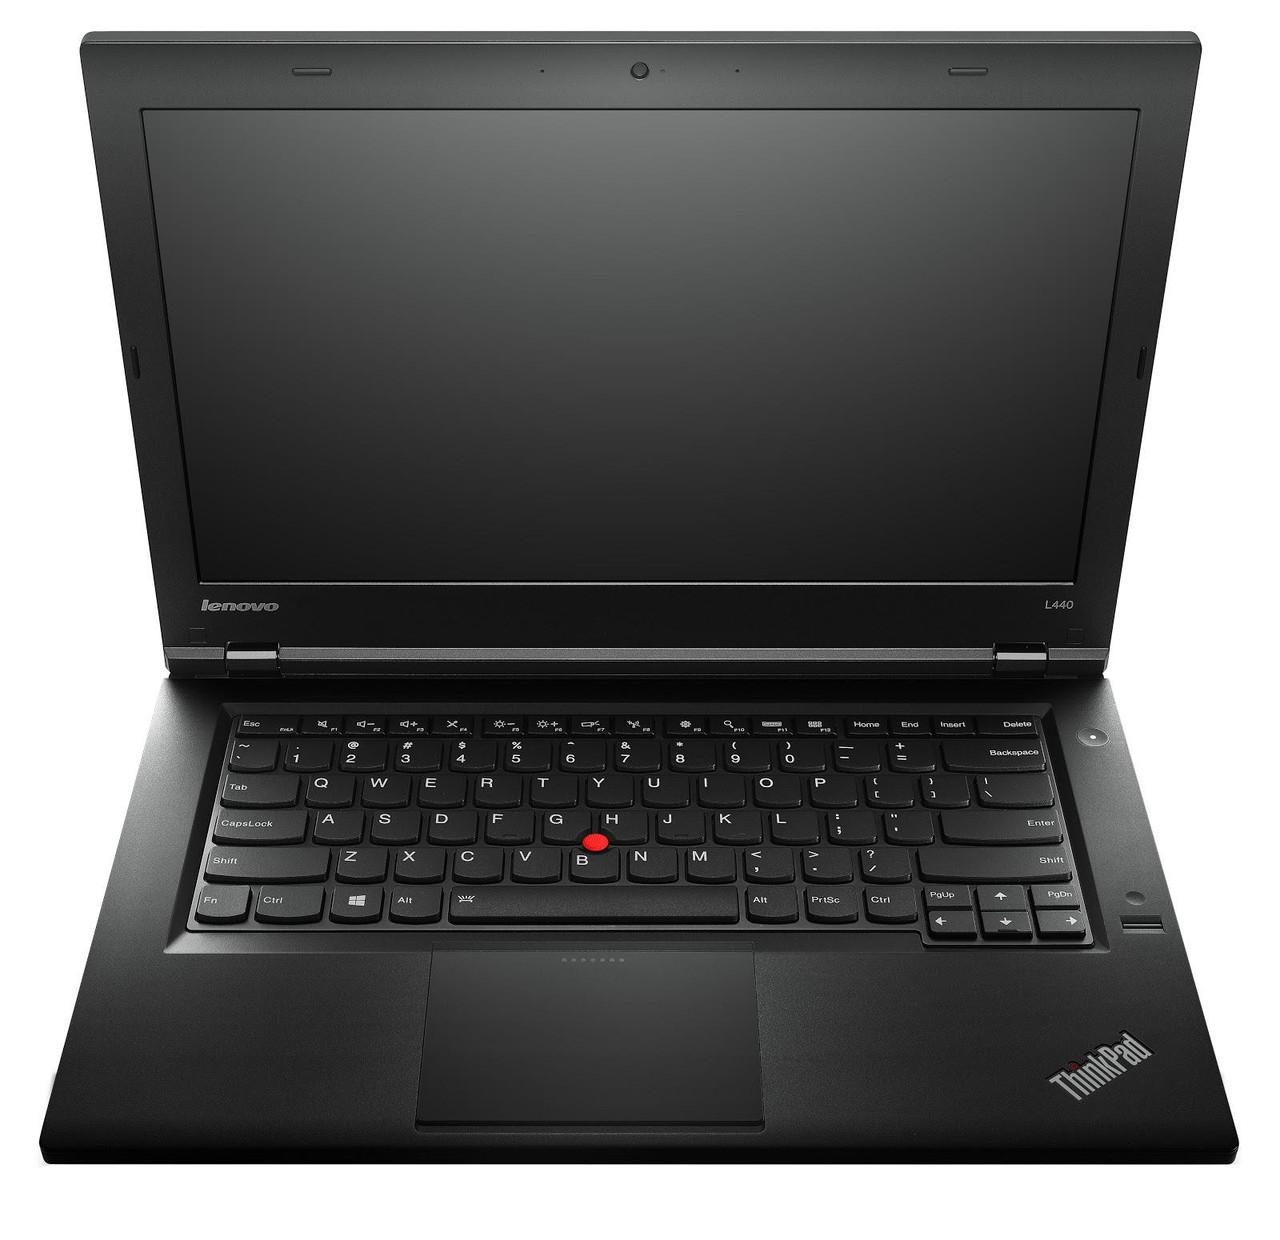 Ноутбук Lenovo ThinkPad L440-Intel Pentium 3550M-2,3GHz-4Gb-DDR3-500Gb-HDD-DVD-R-W14-Web-(B)- Б/У